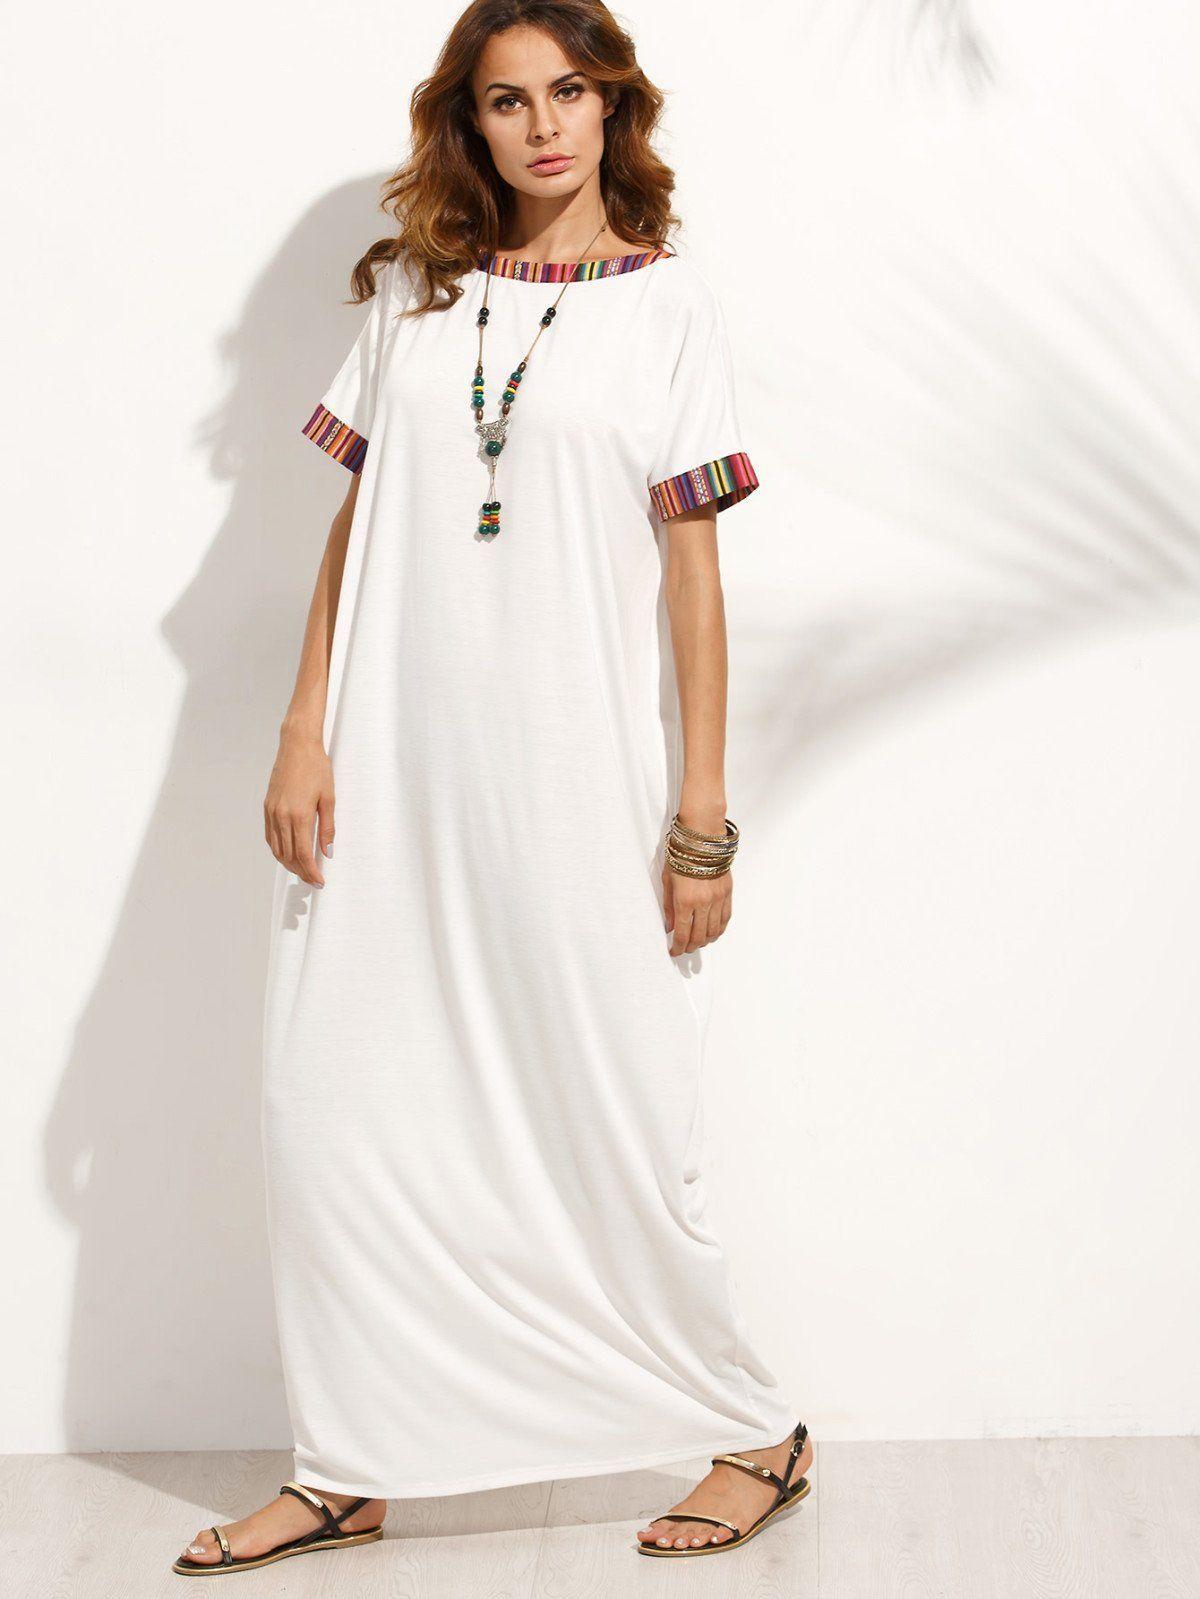 Contrast striped trim full length dress full length dresses tunic